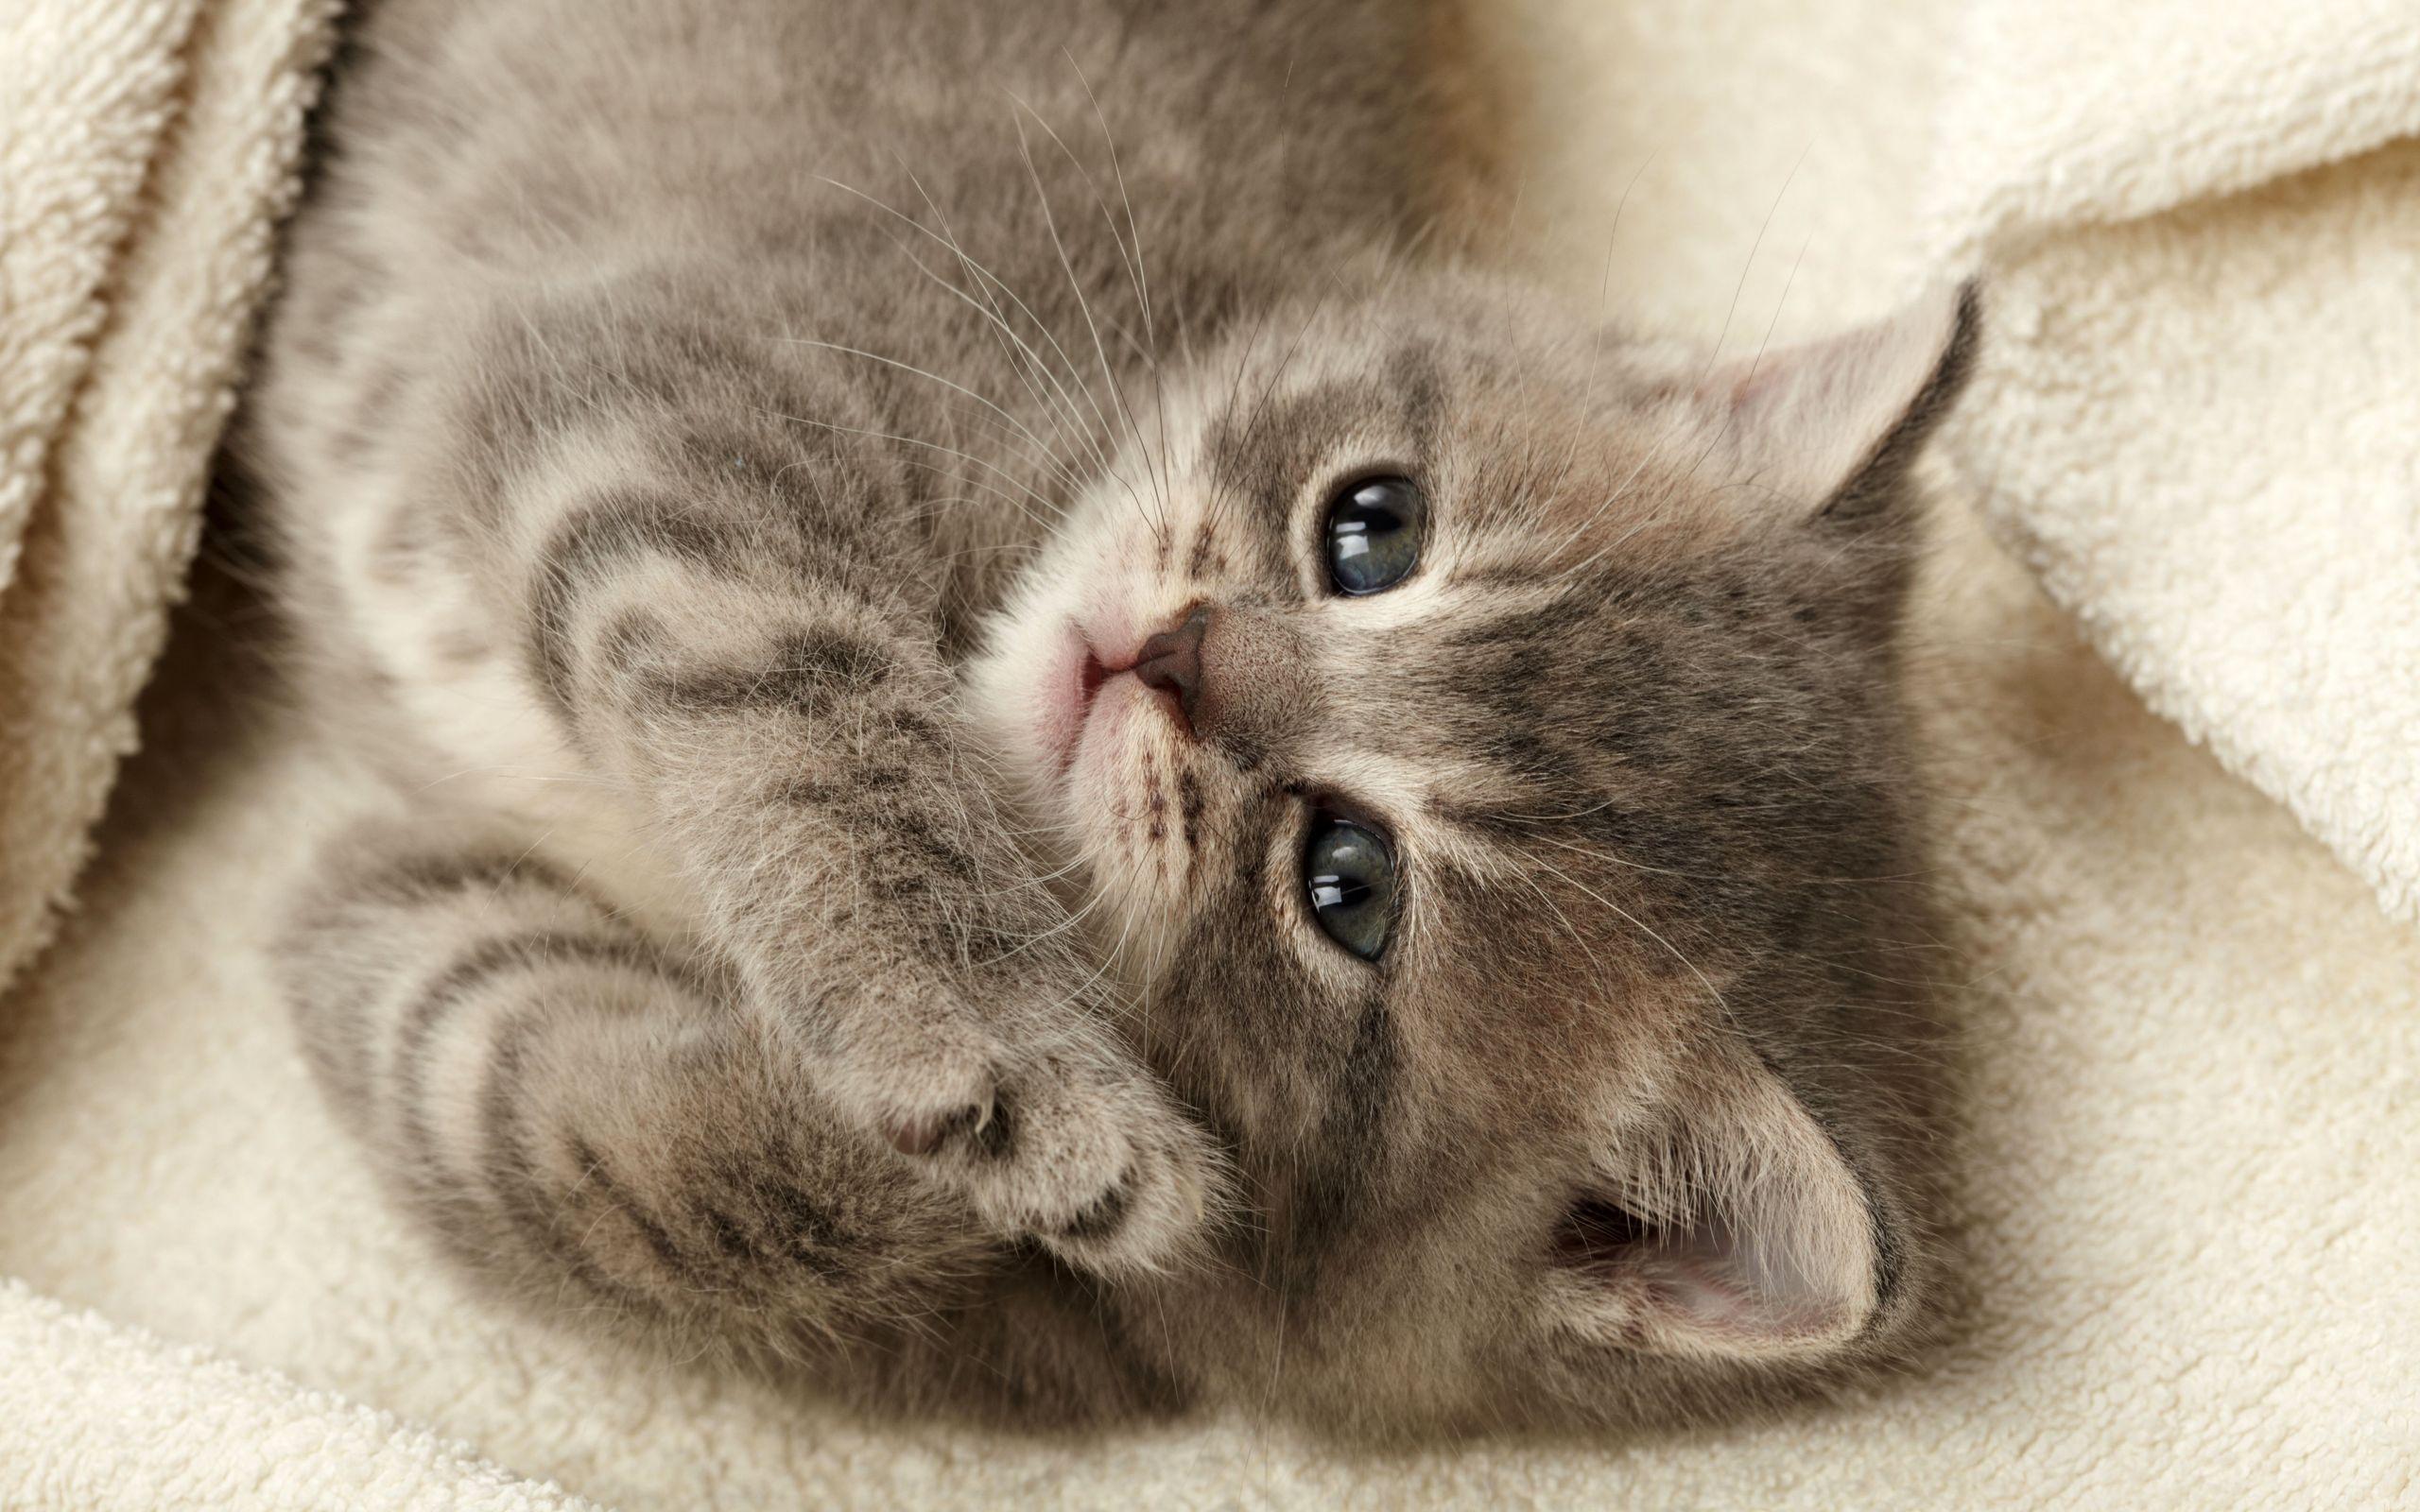 Sleepy Smoky Kitten Eyes - Sleepy Smoky Kitten Eyes